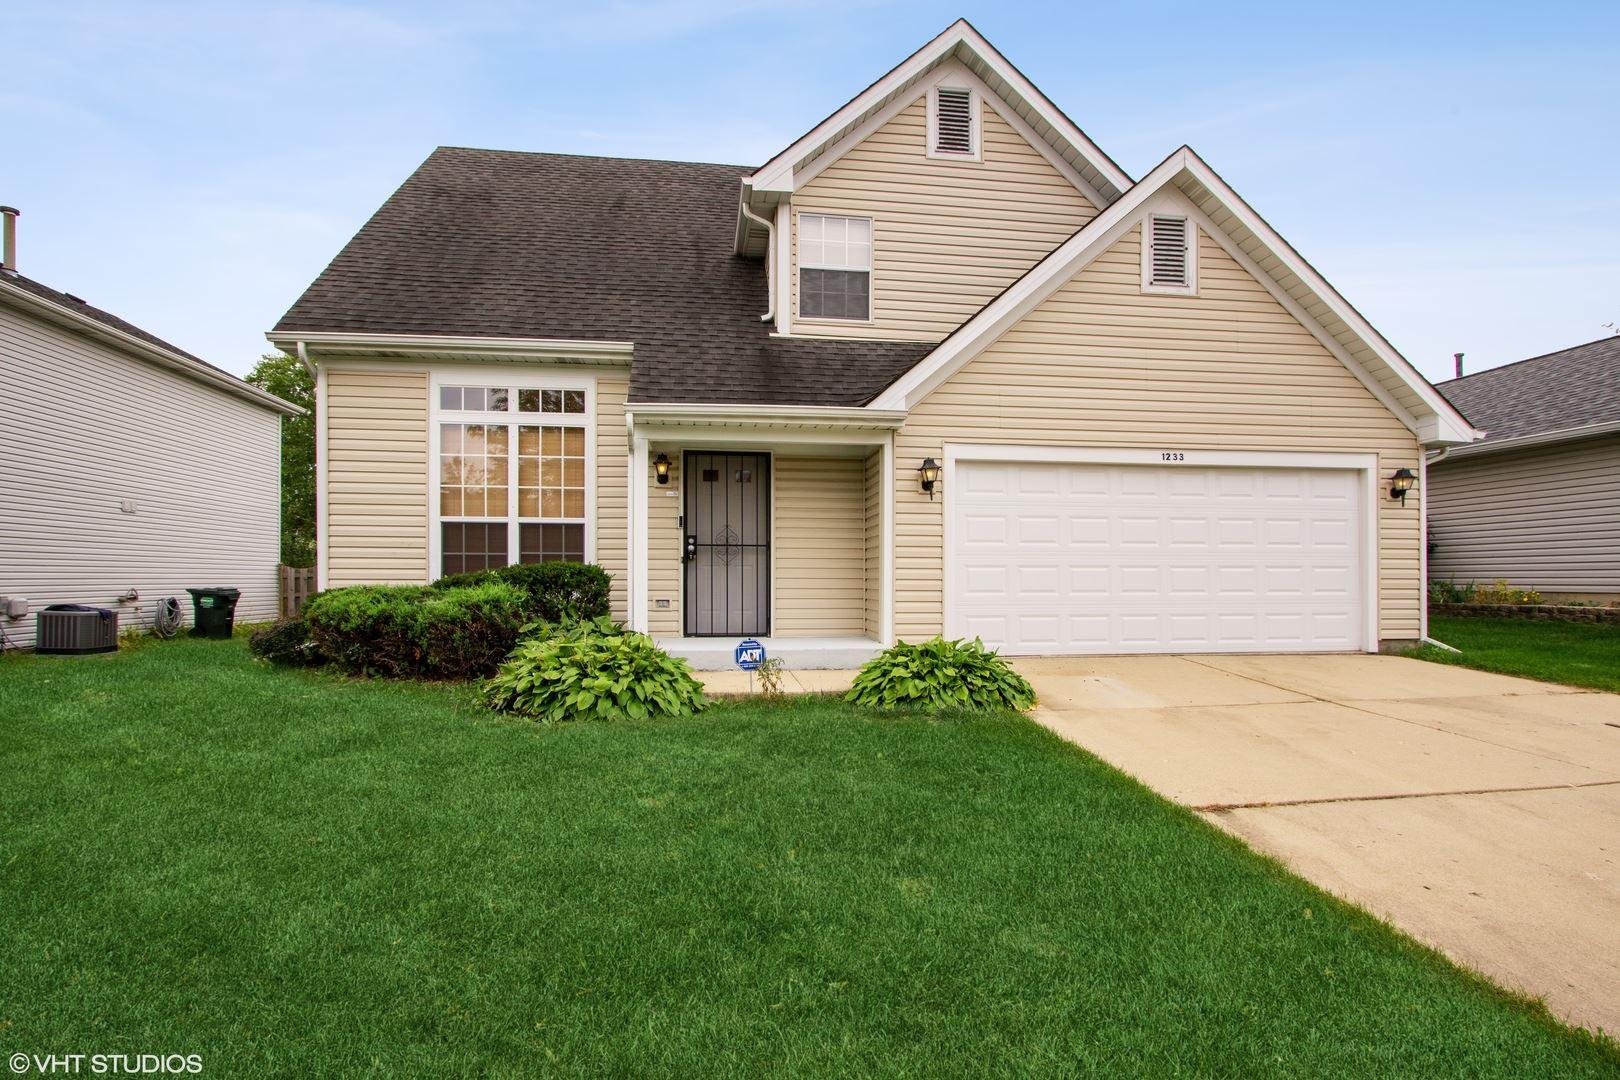 1233 Clover Lane, Hoffman Estates, IL 60192 - #: 11249809